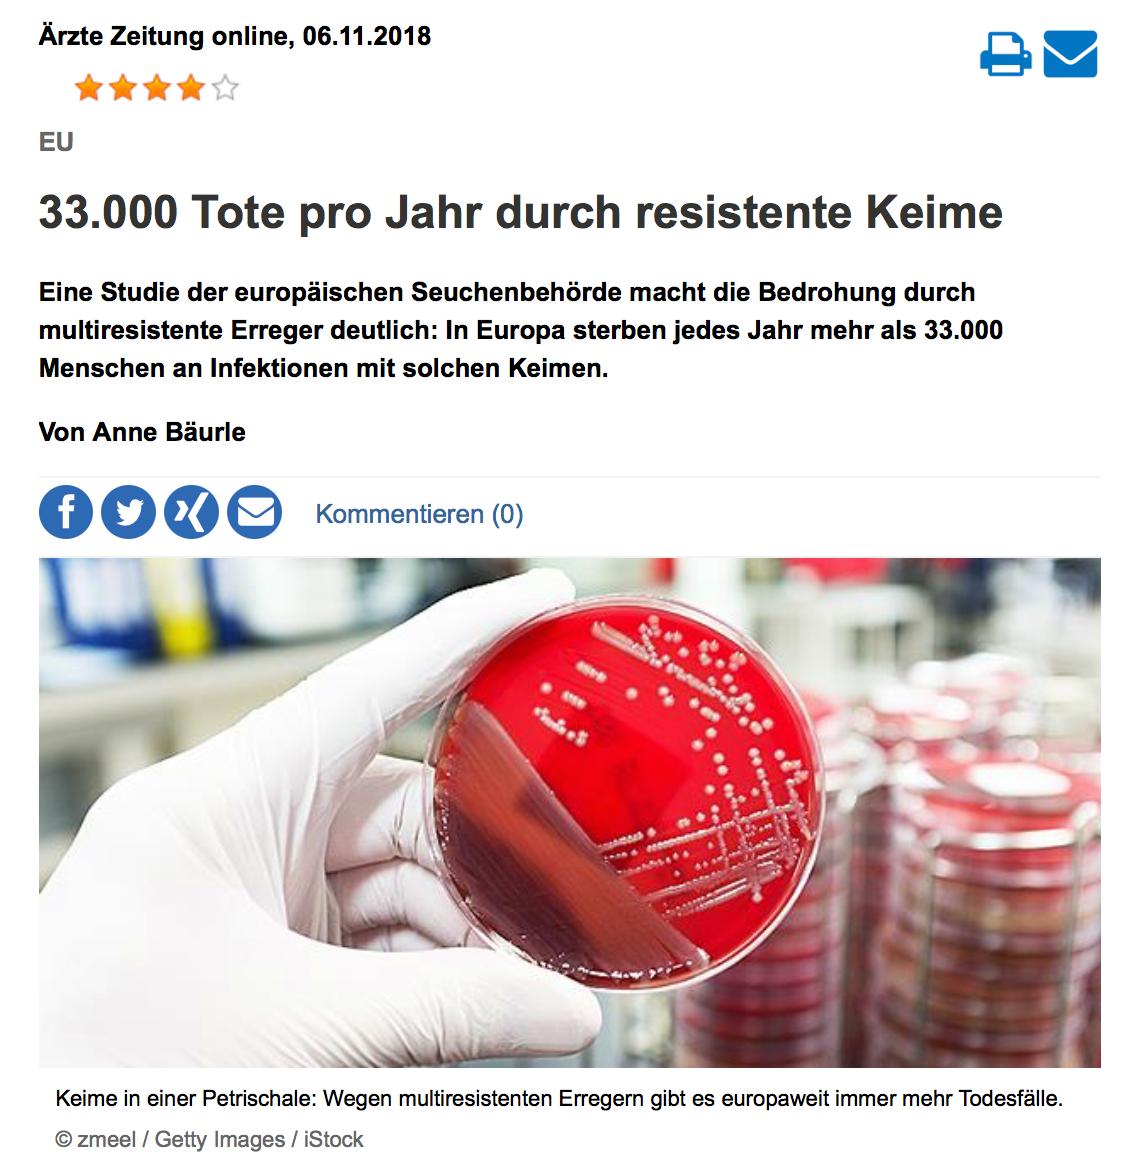 33000 tote pro Jahr durch resistente Keime